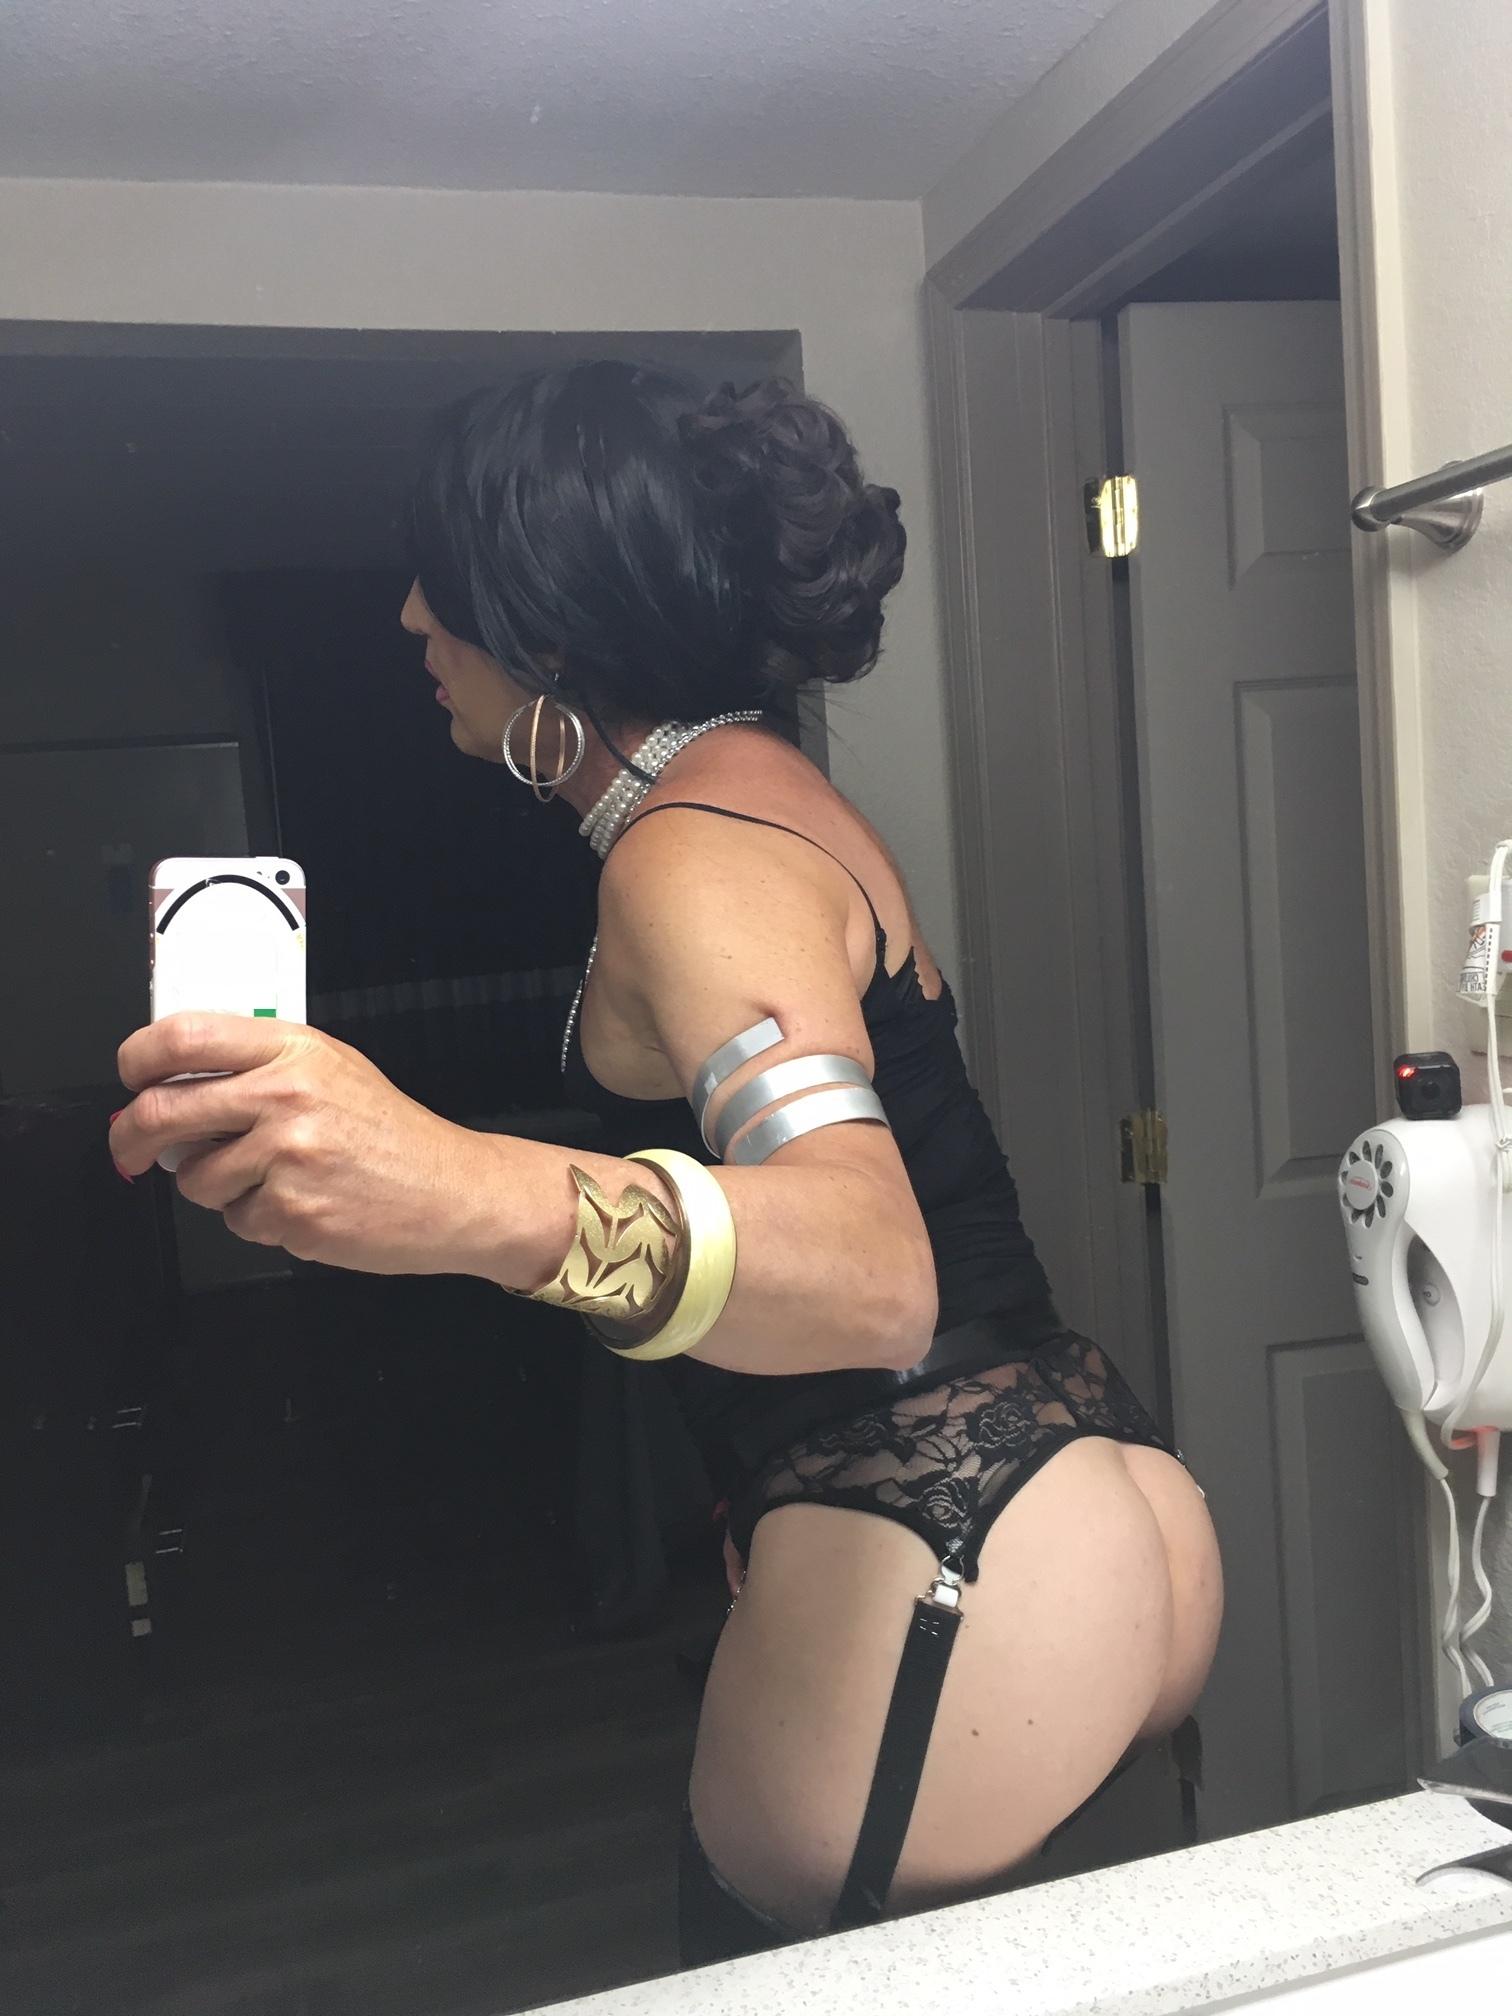 Husband slave cuckold femdom stories